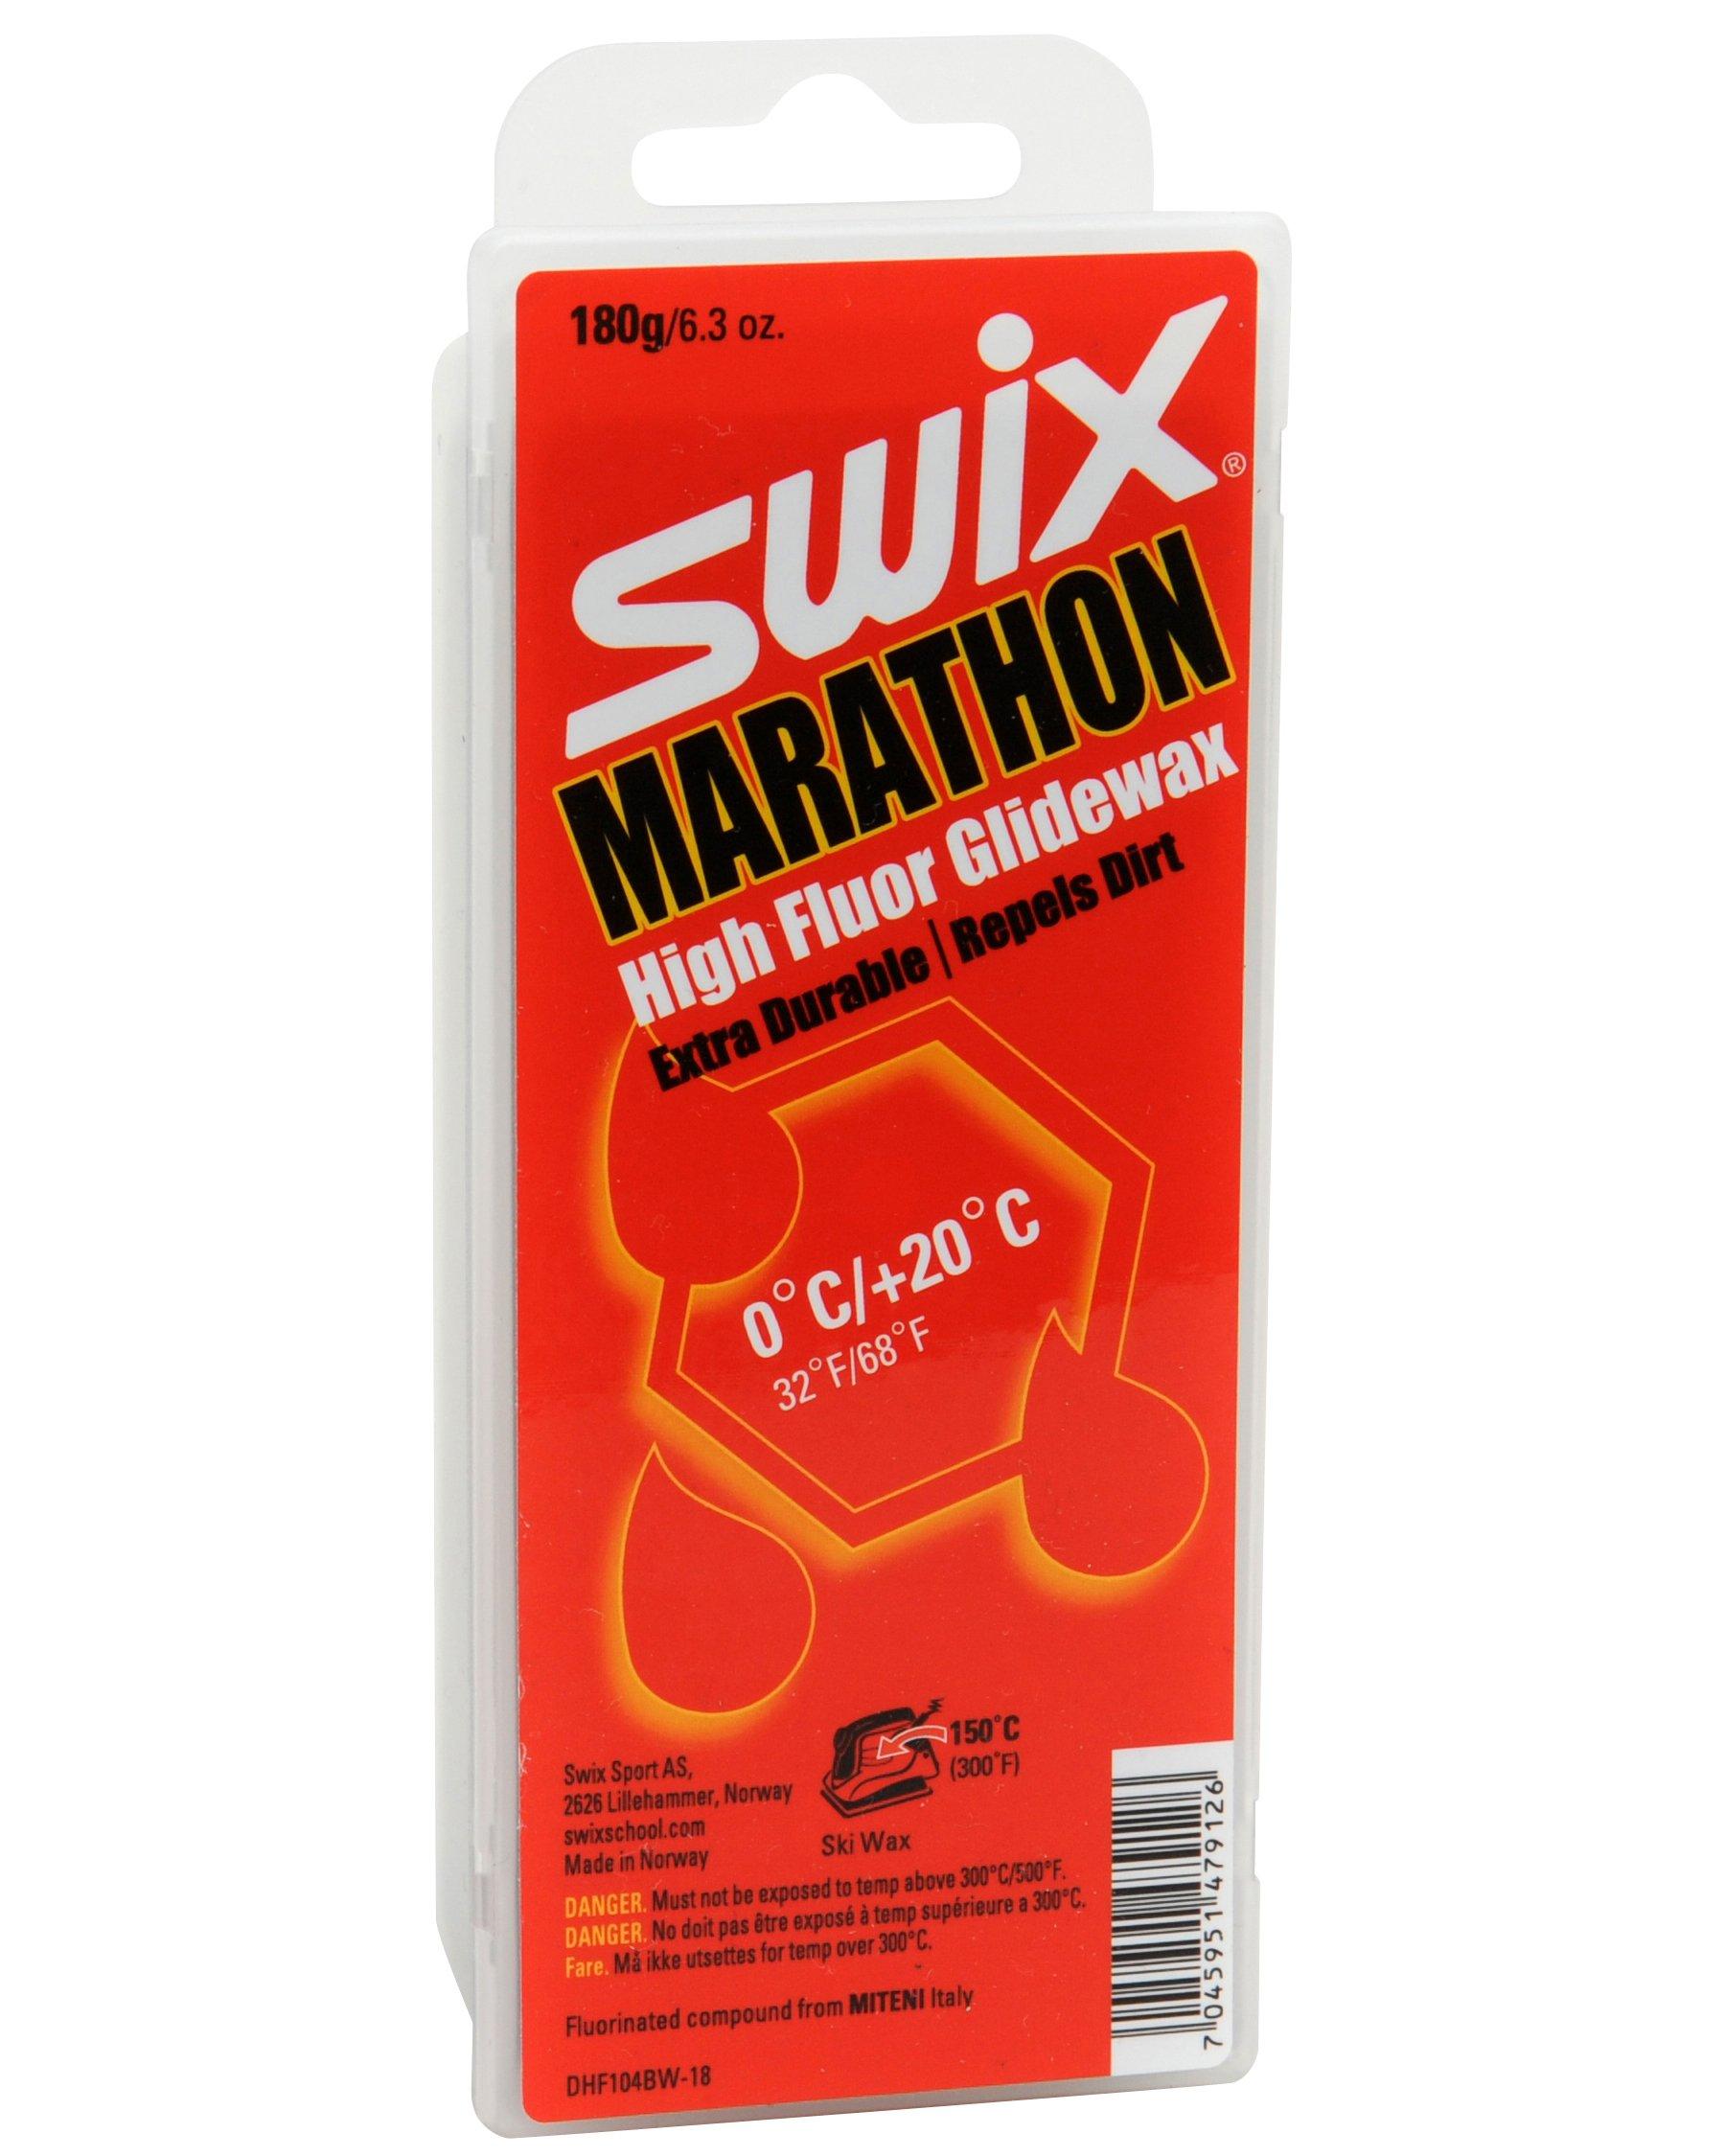 Swix DHF 104BW-18 Cera F Marathon 'Dirty Harry' High Performance First Layer Wax, Grey, 180gm by Swix